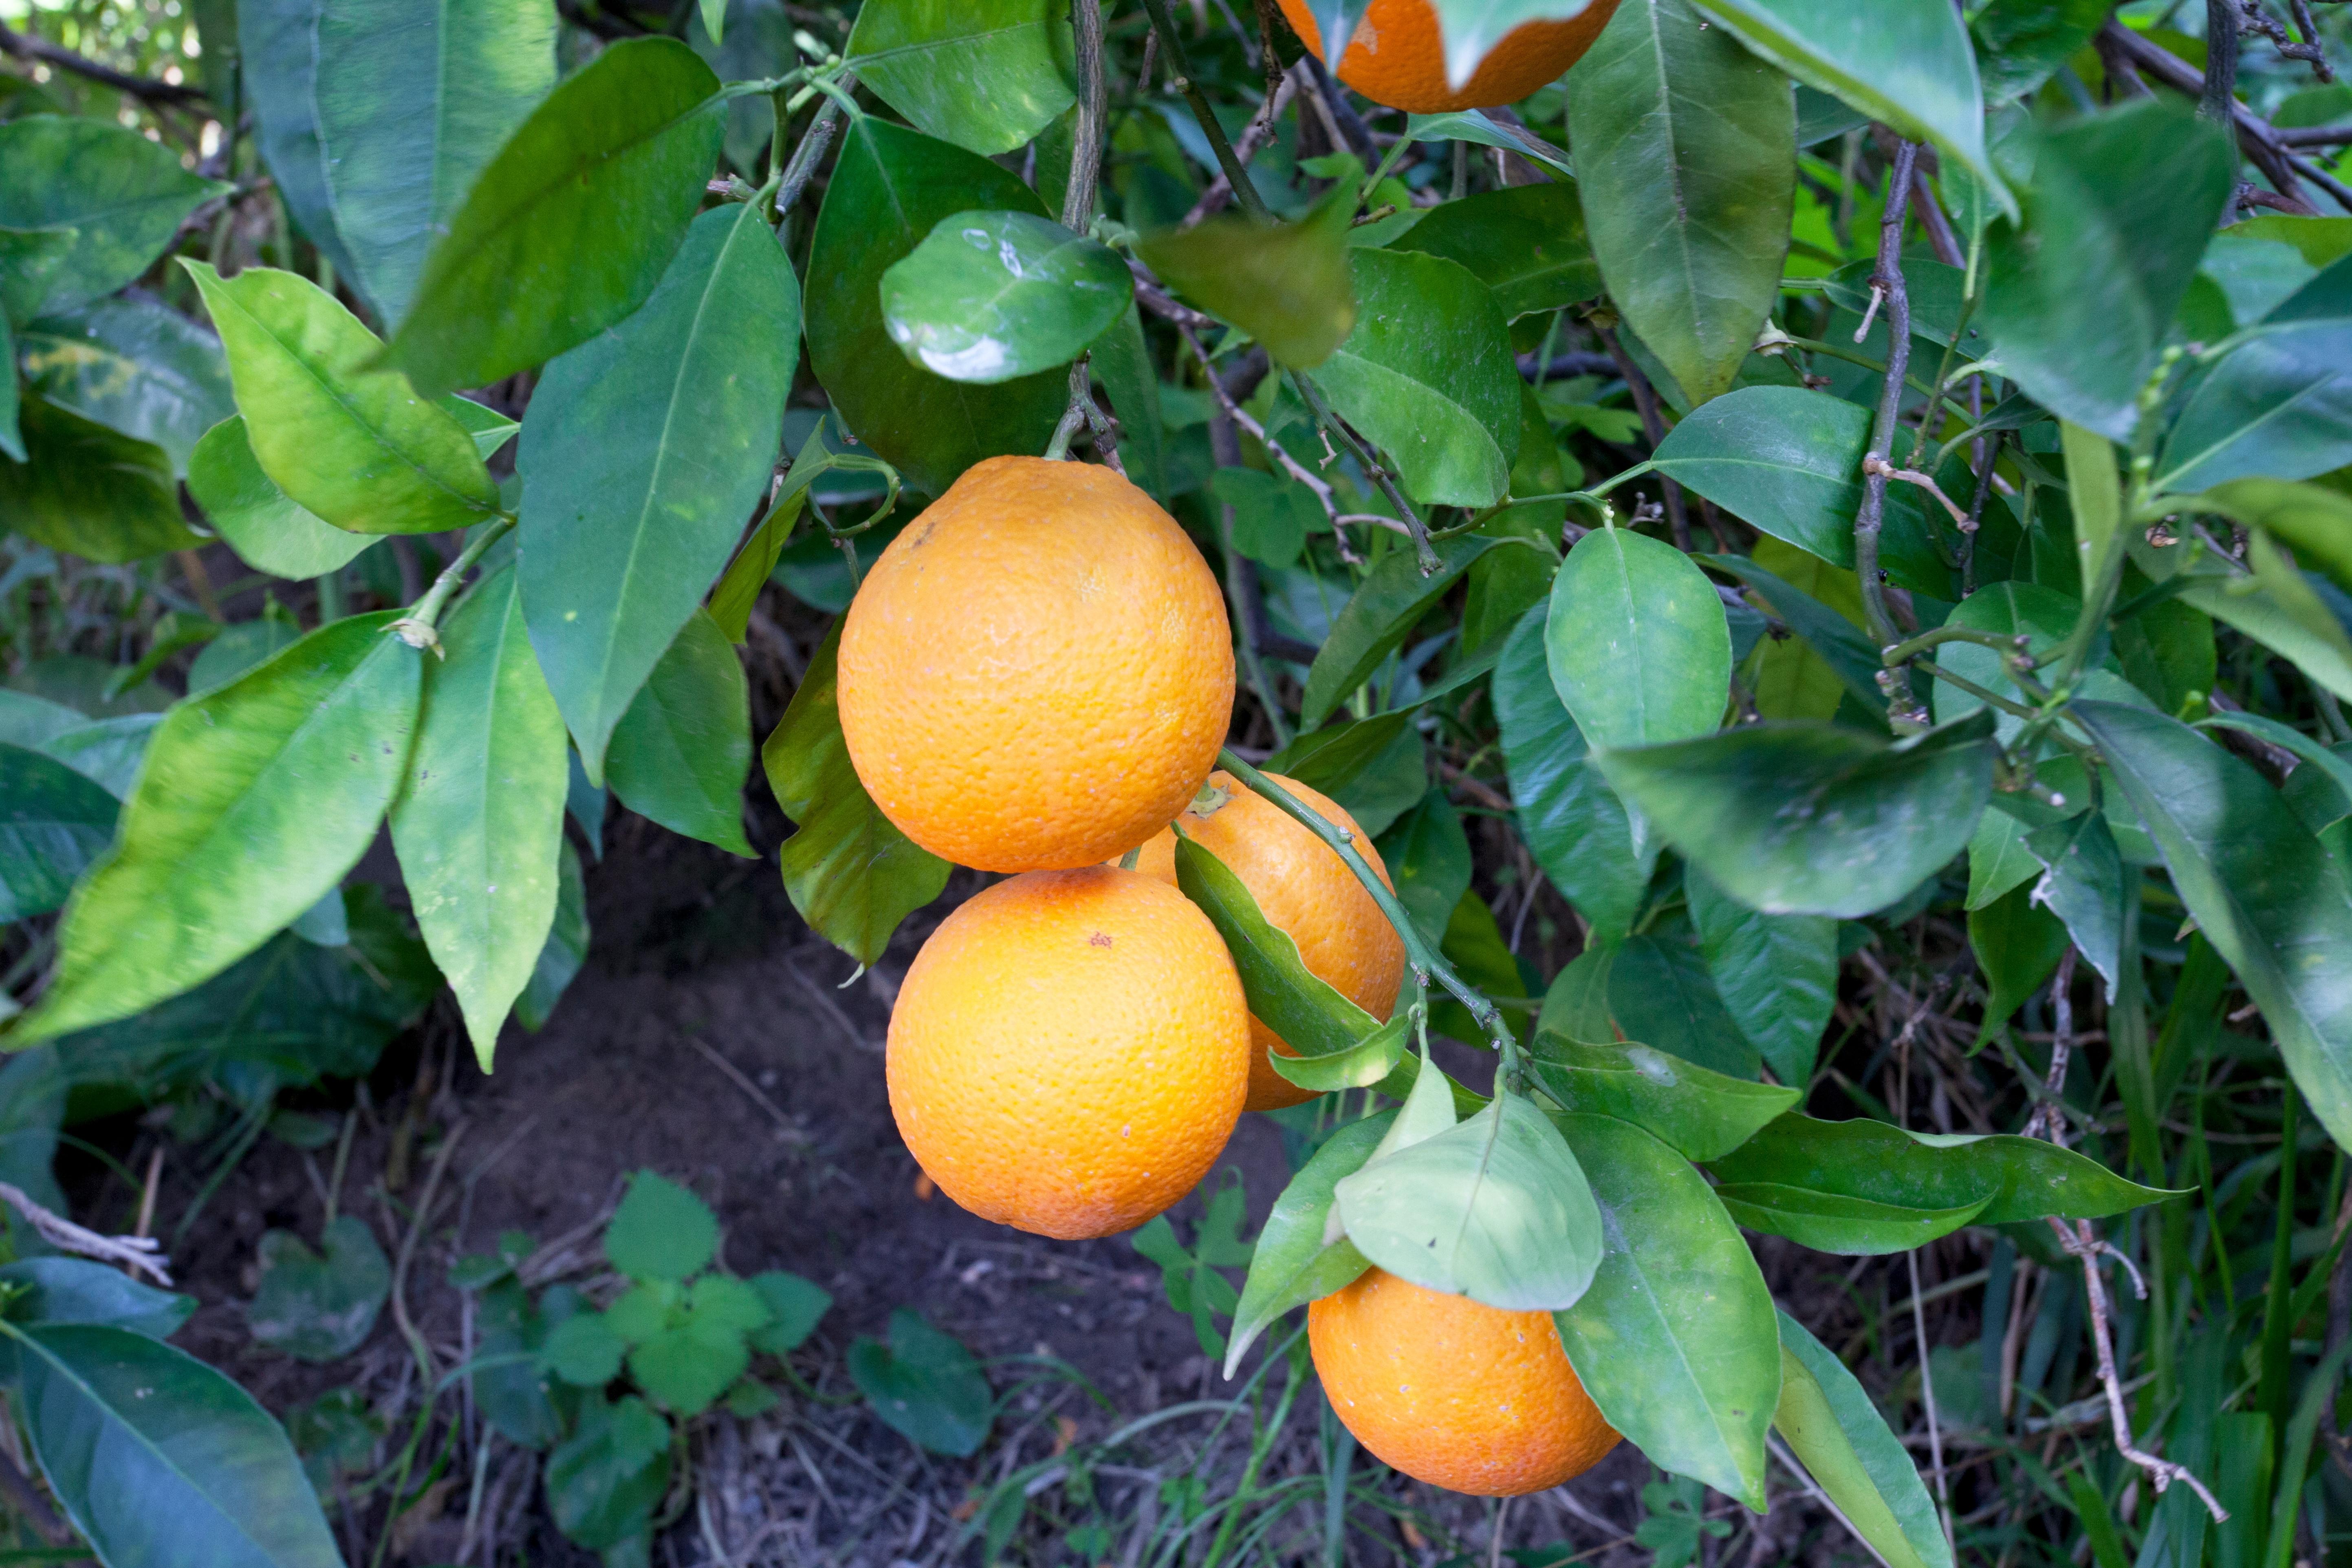 Photo taken by Alan Brown, CSO/Owner, visiting orange grower's groves.